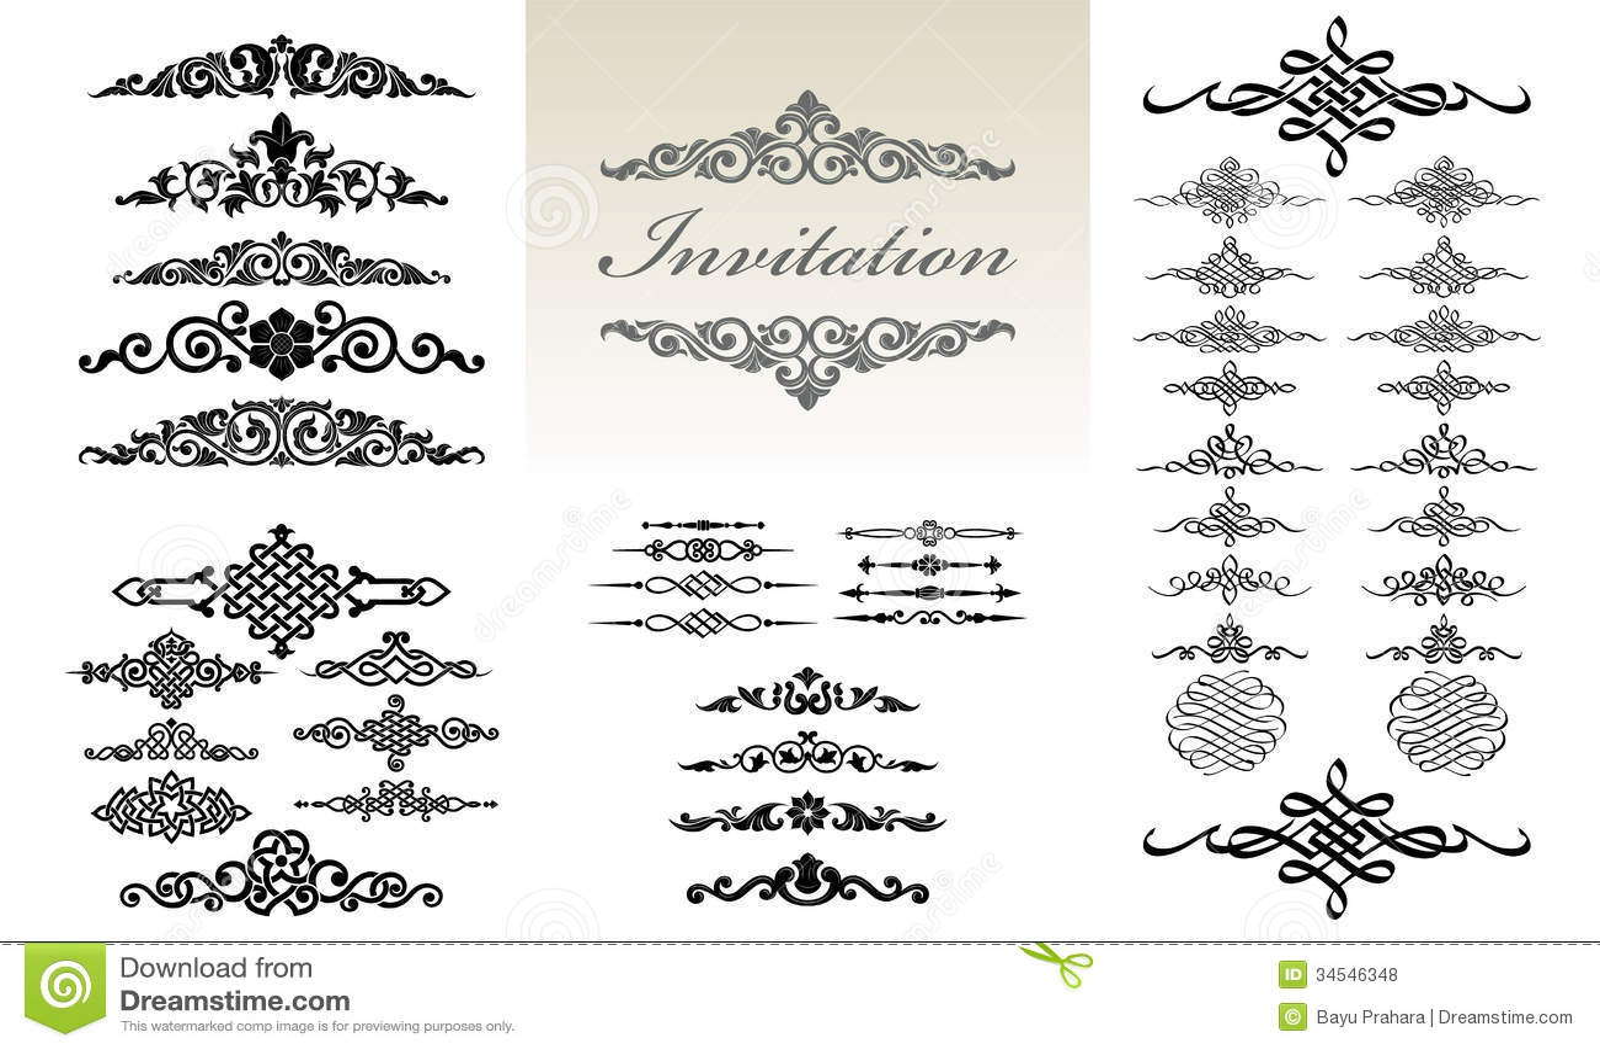 Calligraphic Amp Ornament Design Set Stock Vector Image